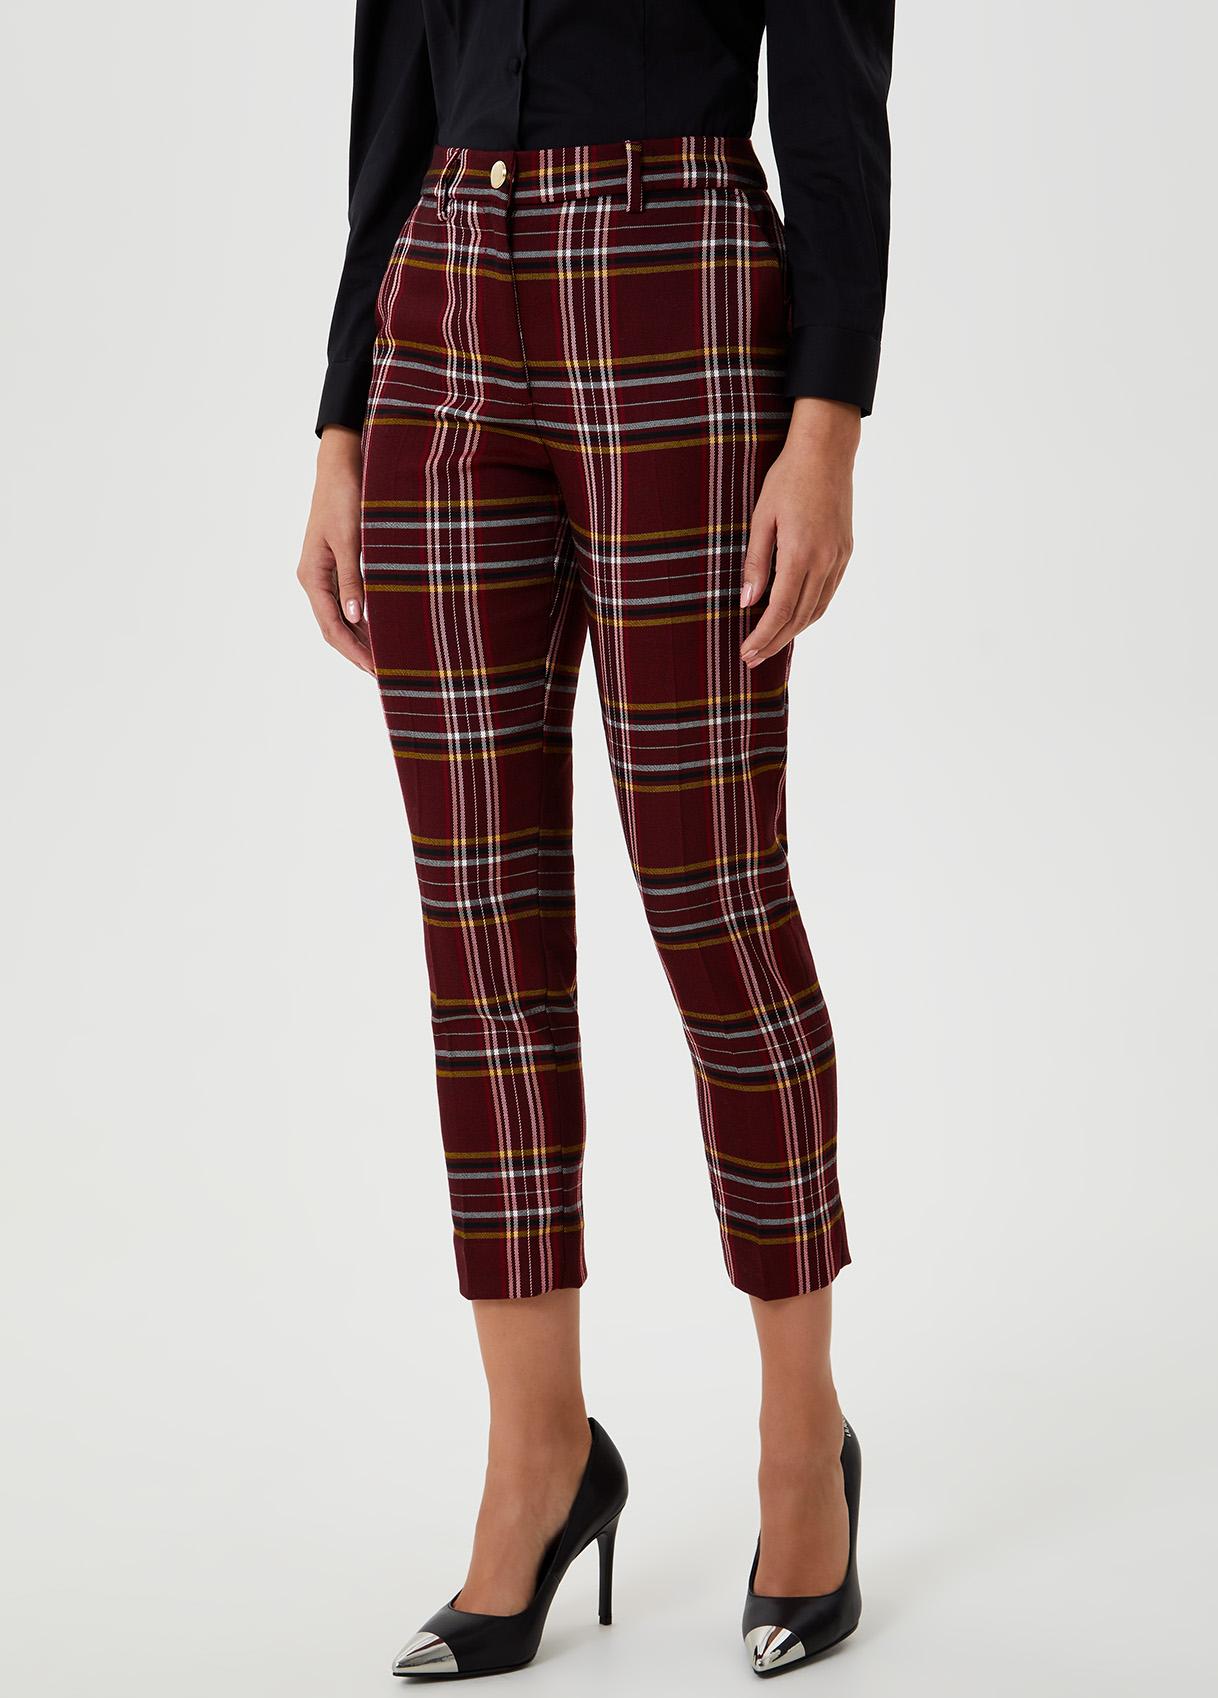 Pantalone in tartan Rosso Liu Jo - large